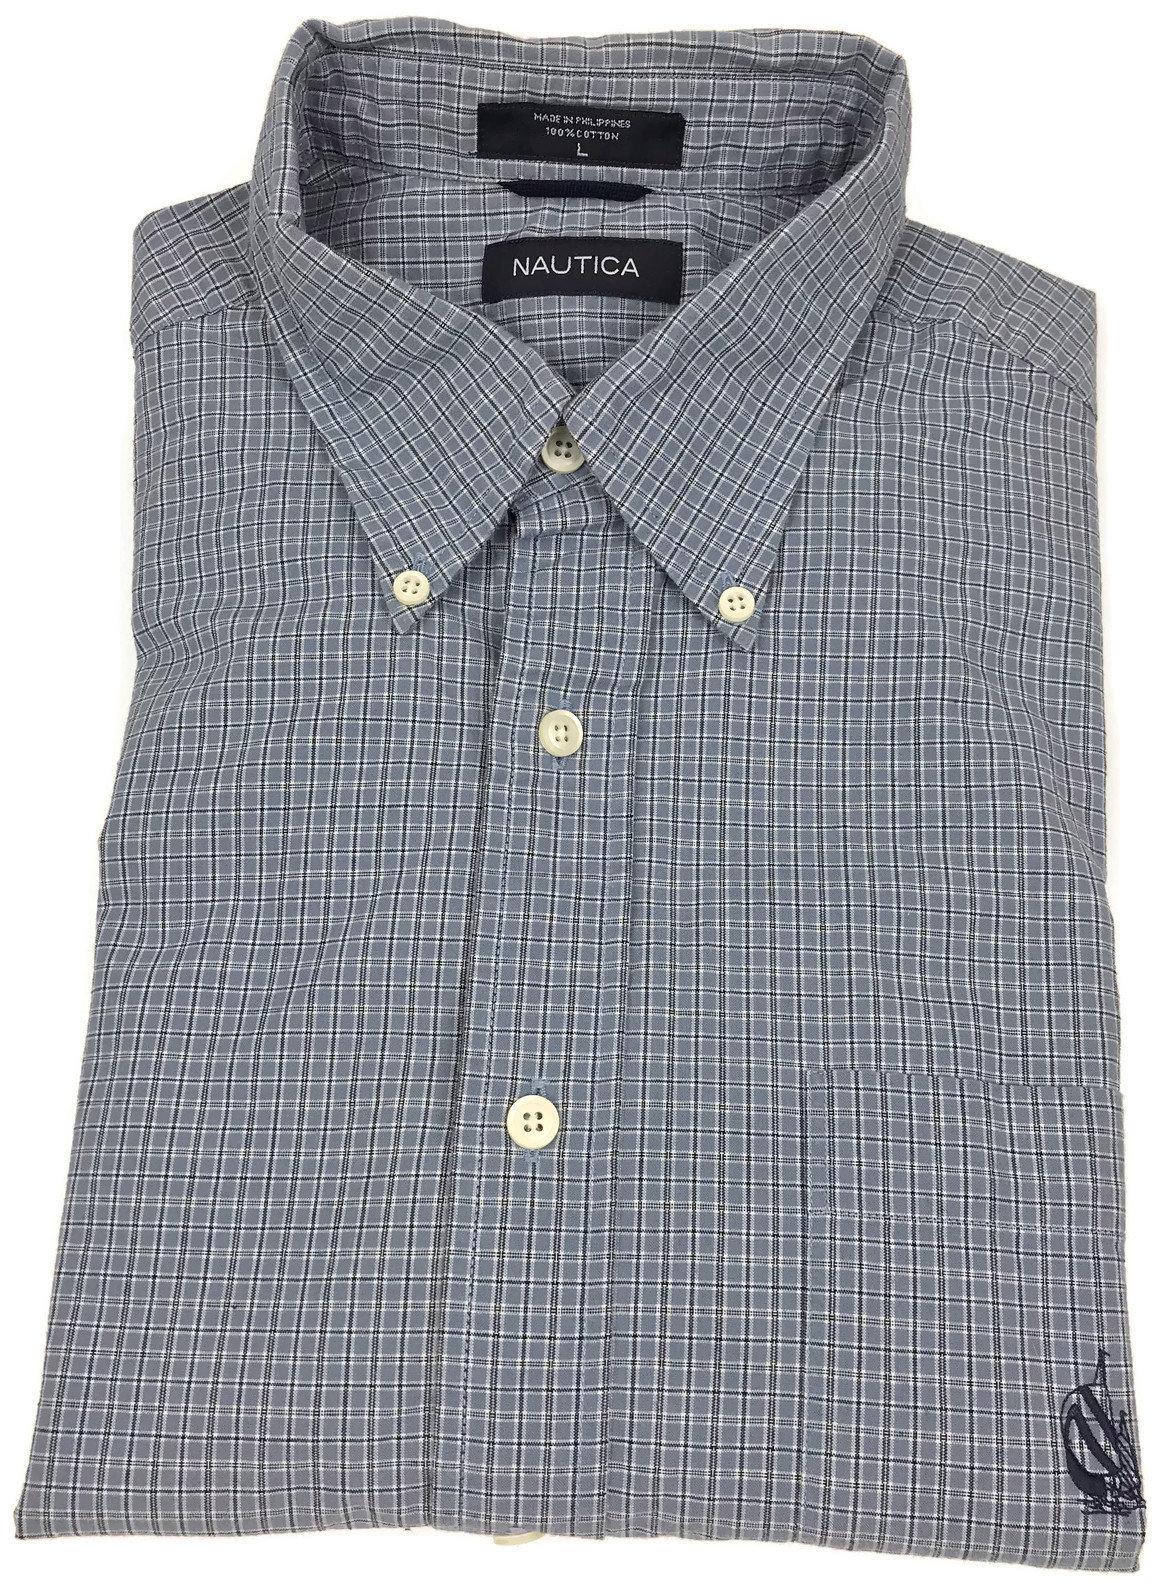 Mens Nautica Short Sleeve Botton Down Shirt Yellow Plaid Xl Superior Materials Men's Clothing